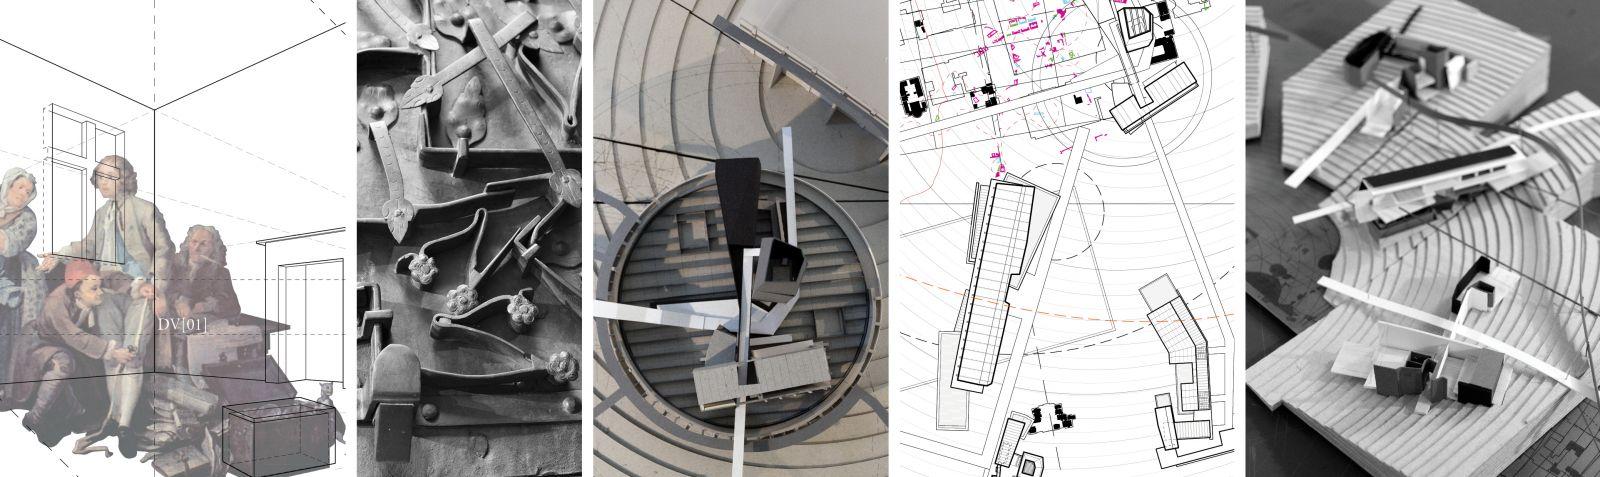 MArch MSc AUD Architectural Design Tutor University Of Edinburgh